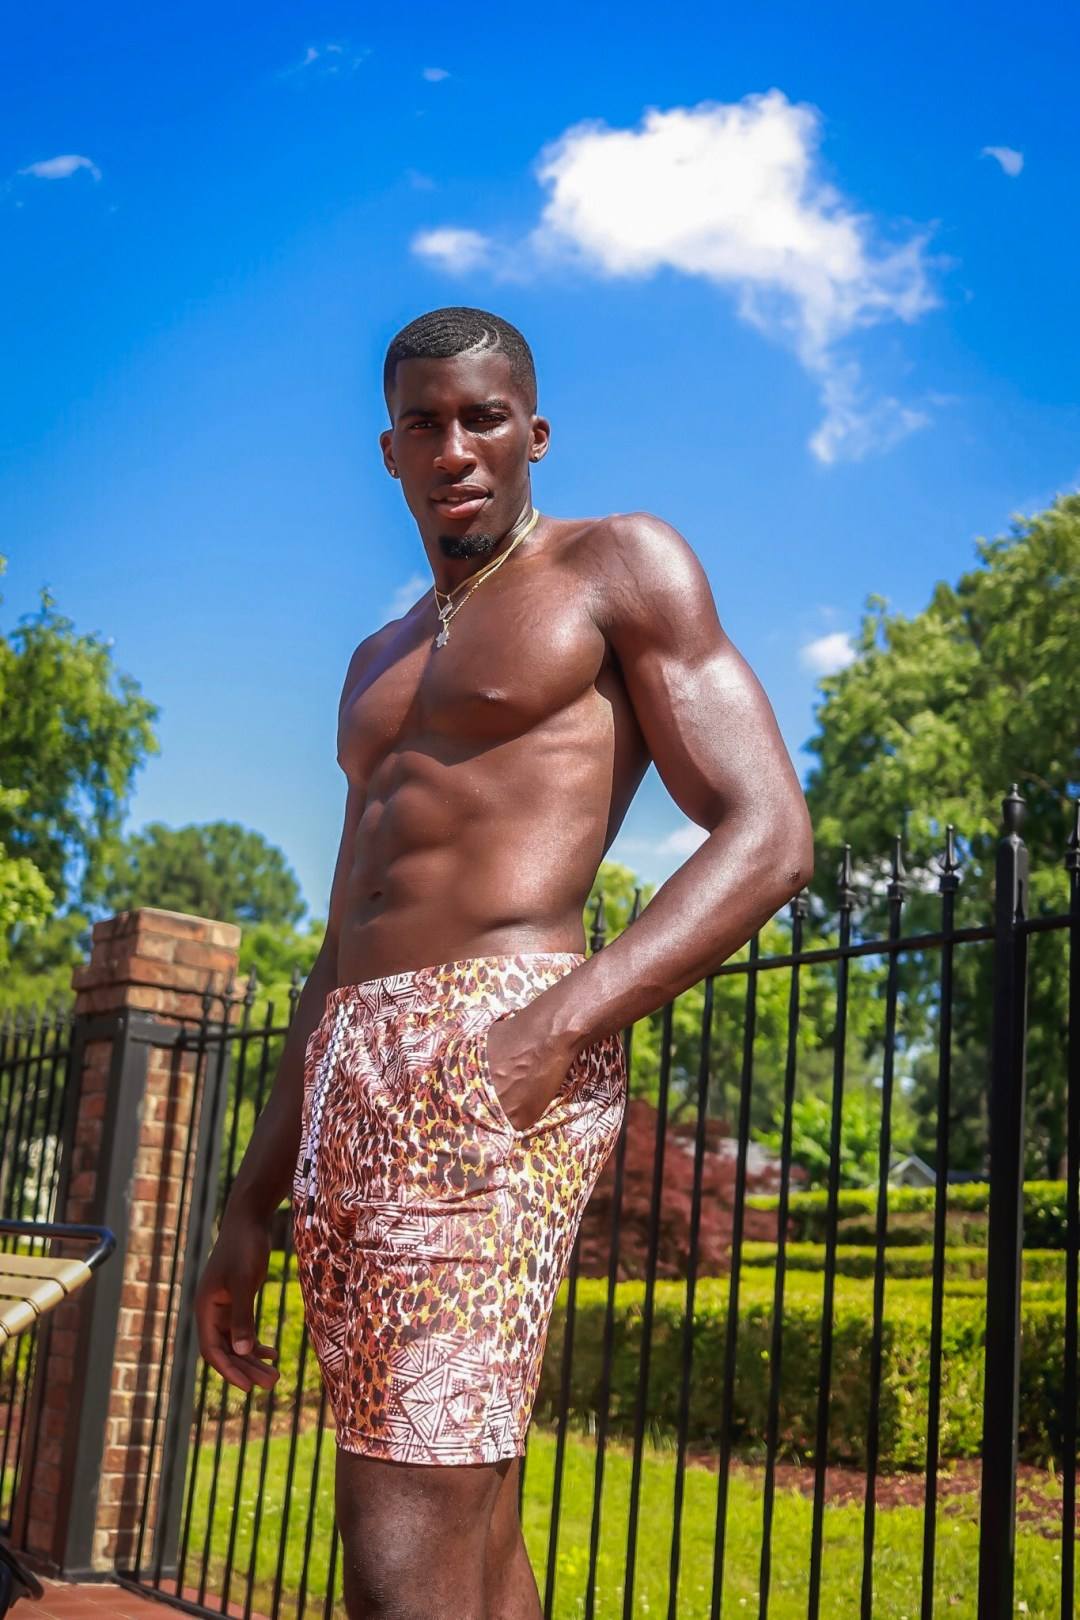 Men's Fashion, Swimsuit, Cheetah-Print Swimming Trunks, Baecation, Black African-American Model, Daniel Obiefuna Nwandu, Fondu, Portrait Photography, Nigerian Igbo Male Model, Actor, Artist, Designer, Commissioner of Reflex Football, RFB